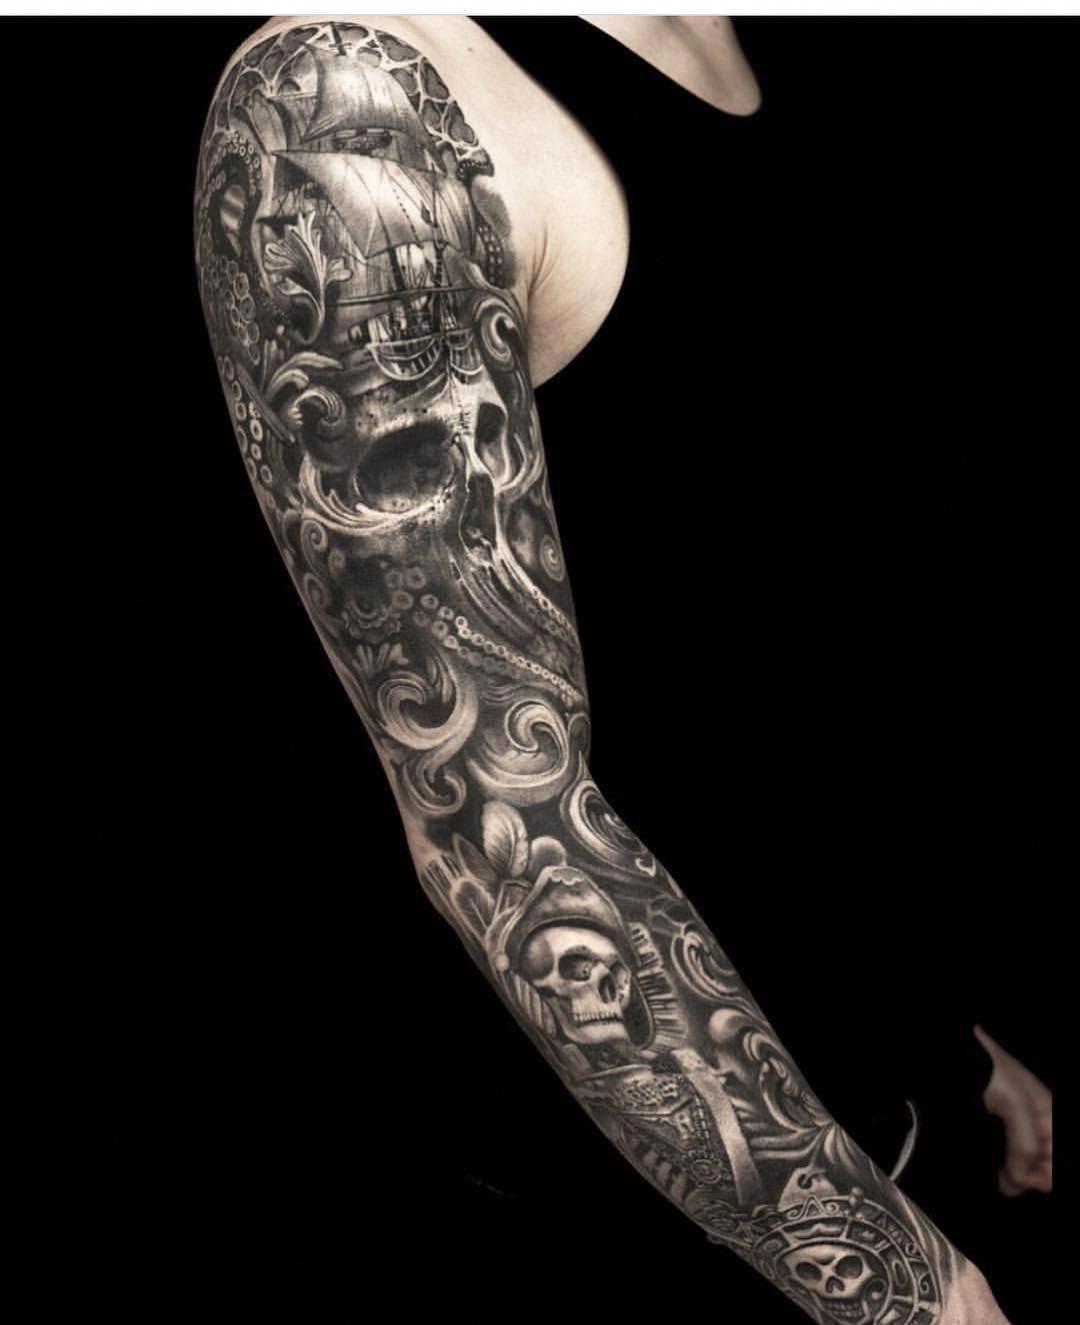 Cardi B Tattoos Arm: Full Sleeve Tattoo Concepts #Fullsleevetattoos